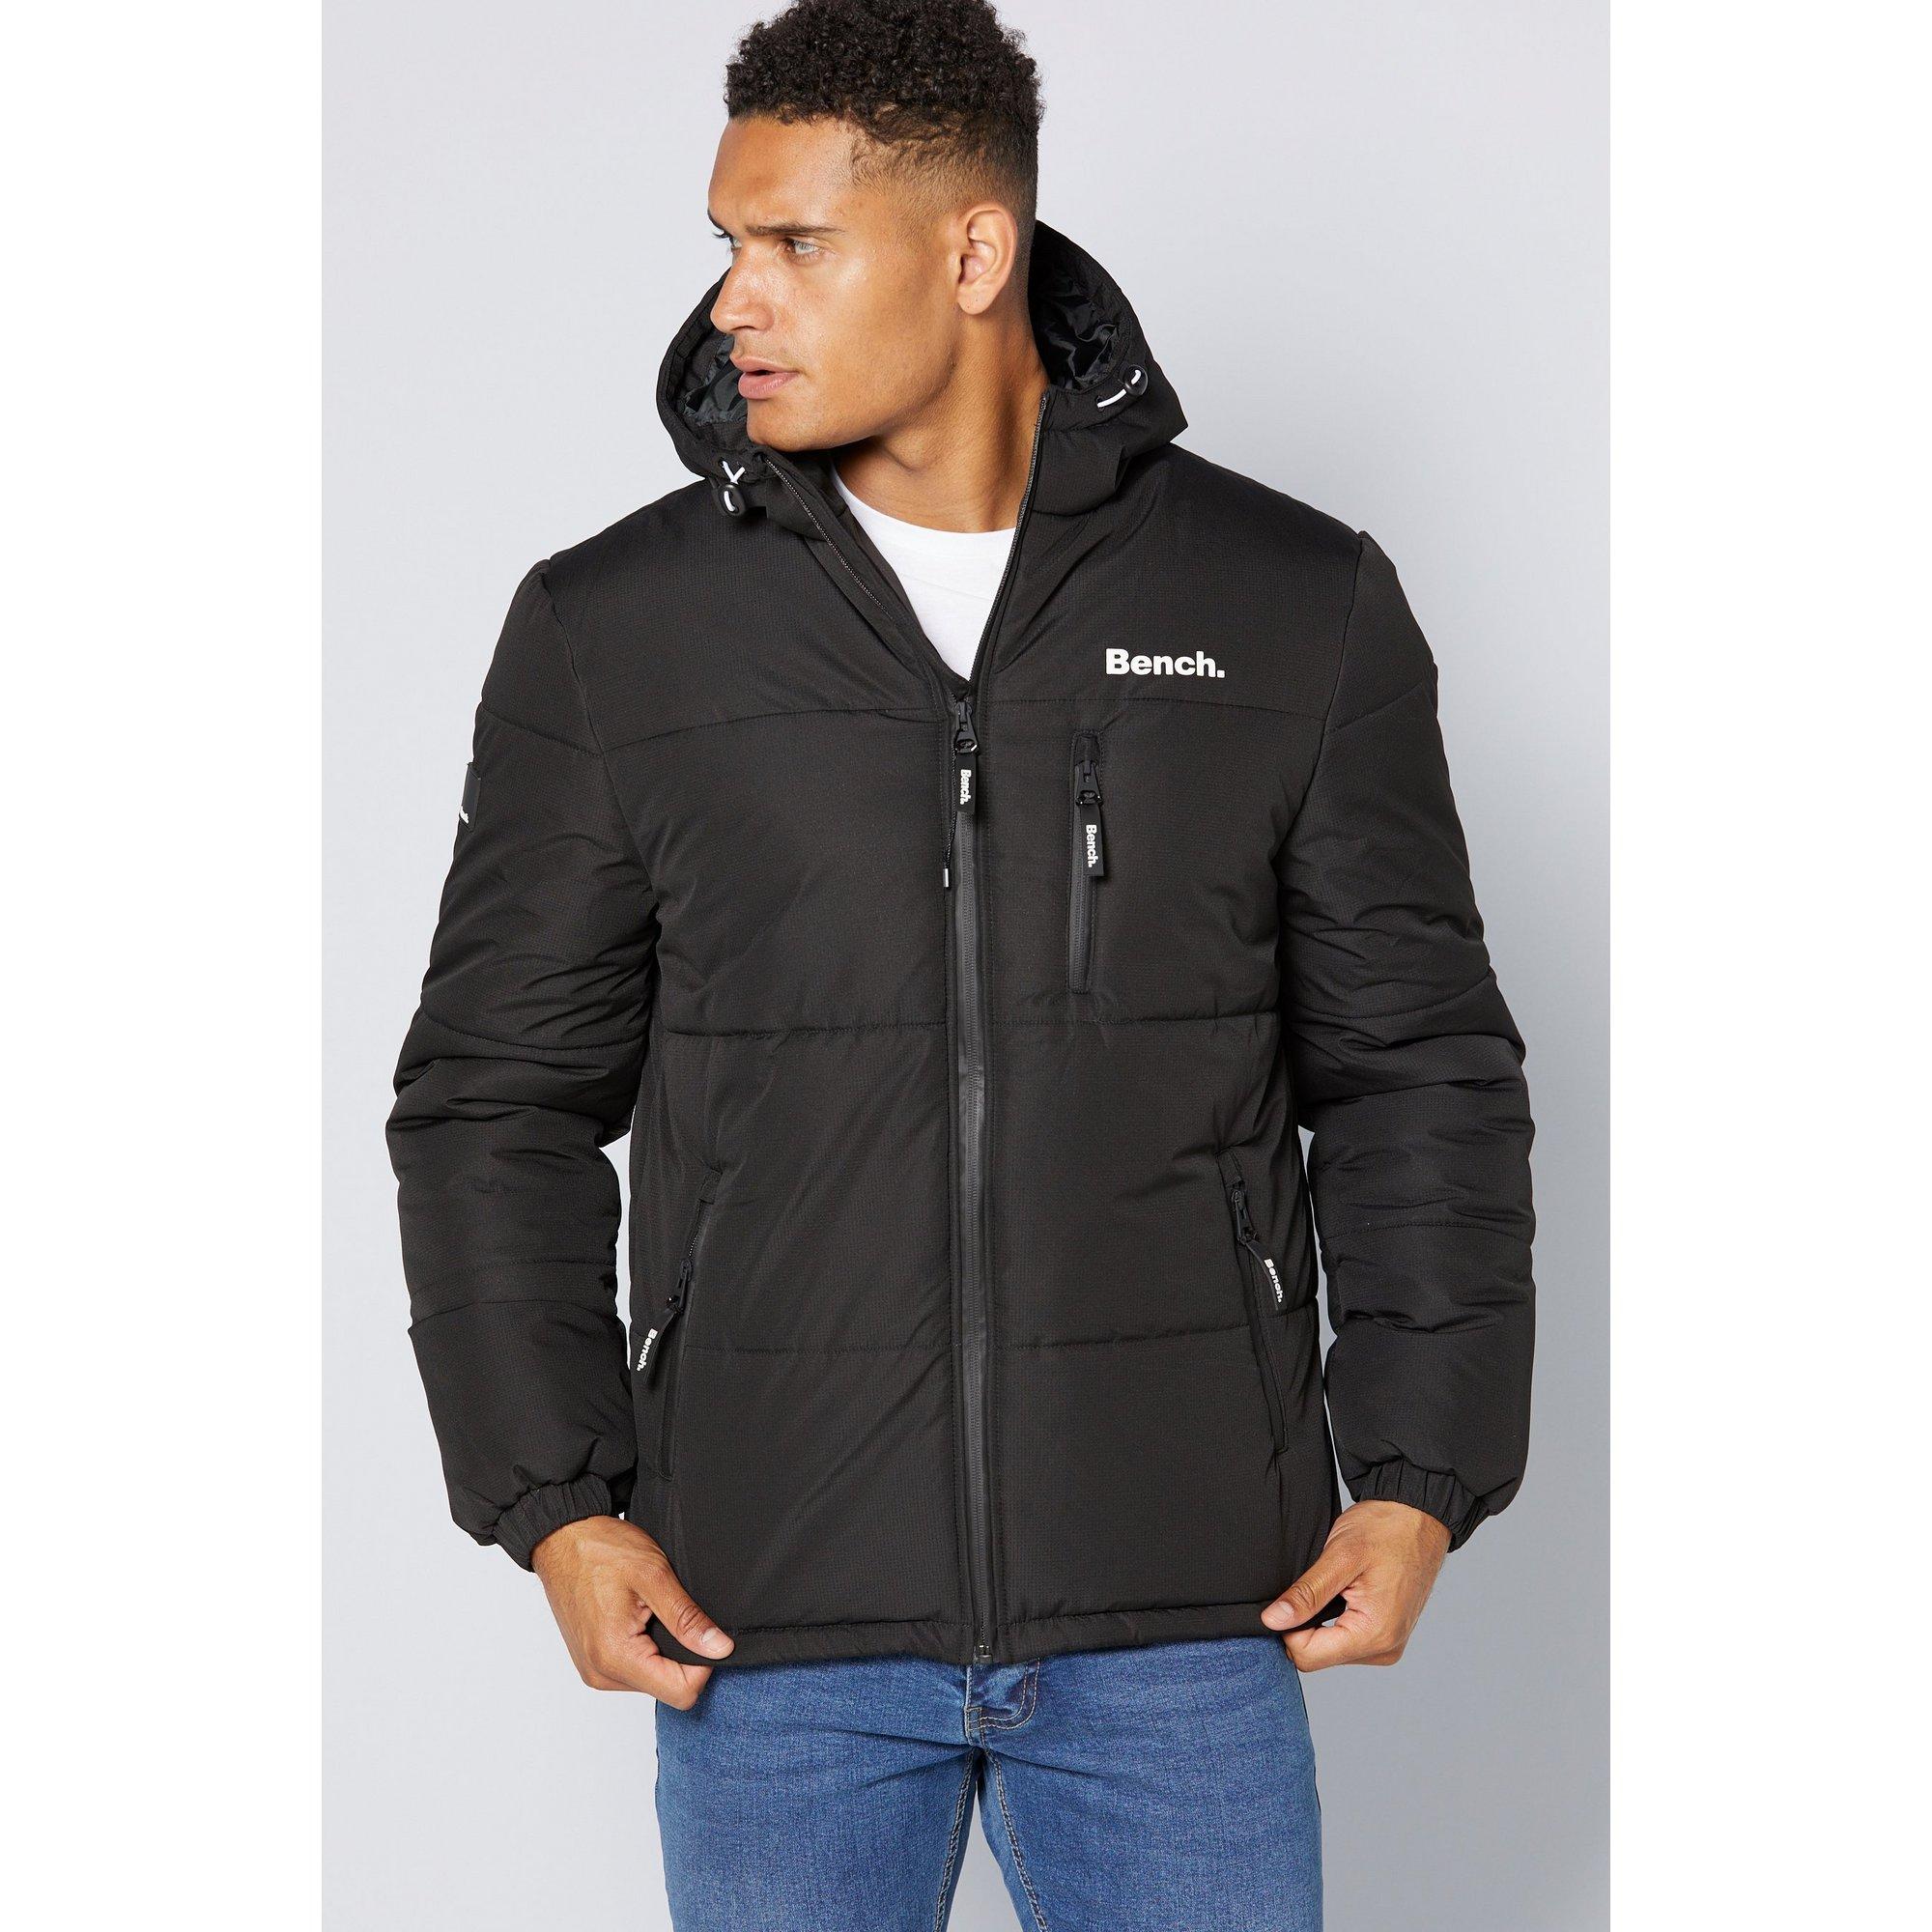 Image of Bench Black Puffer Jacket